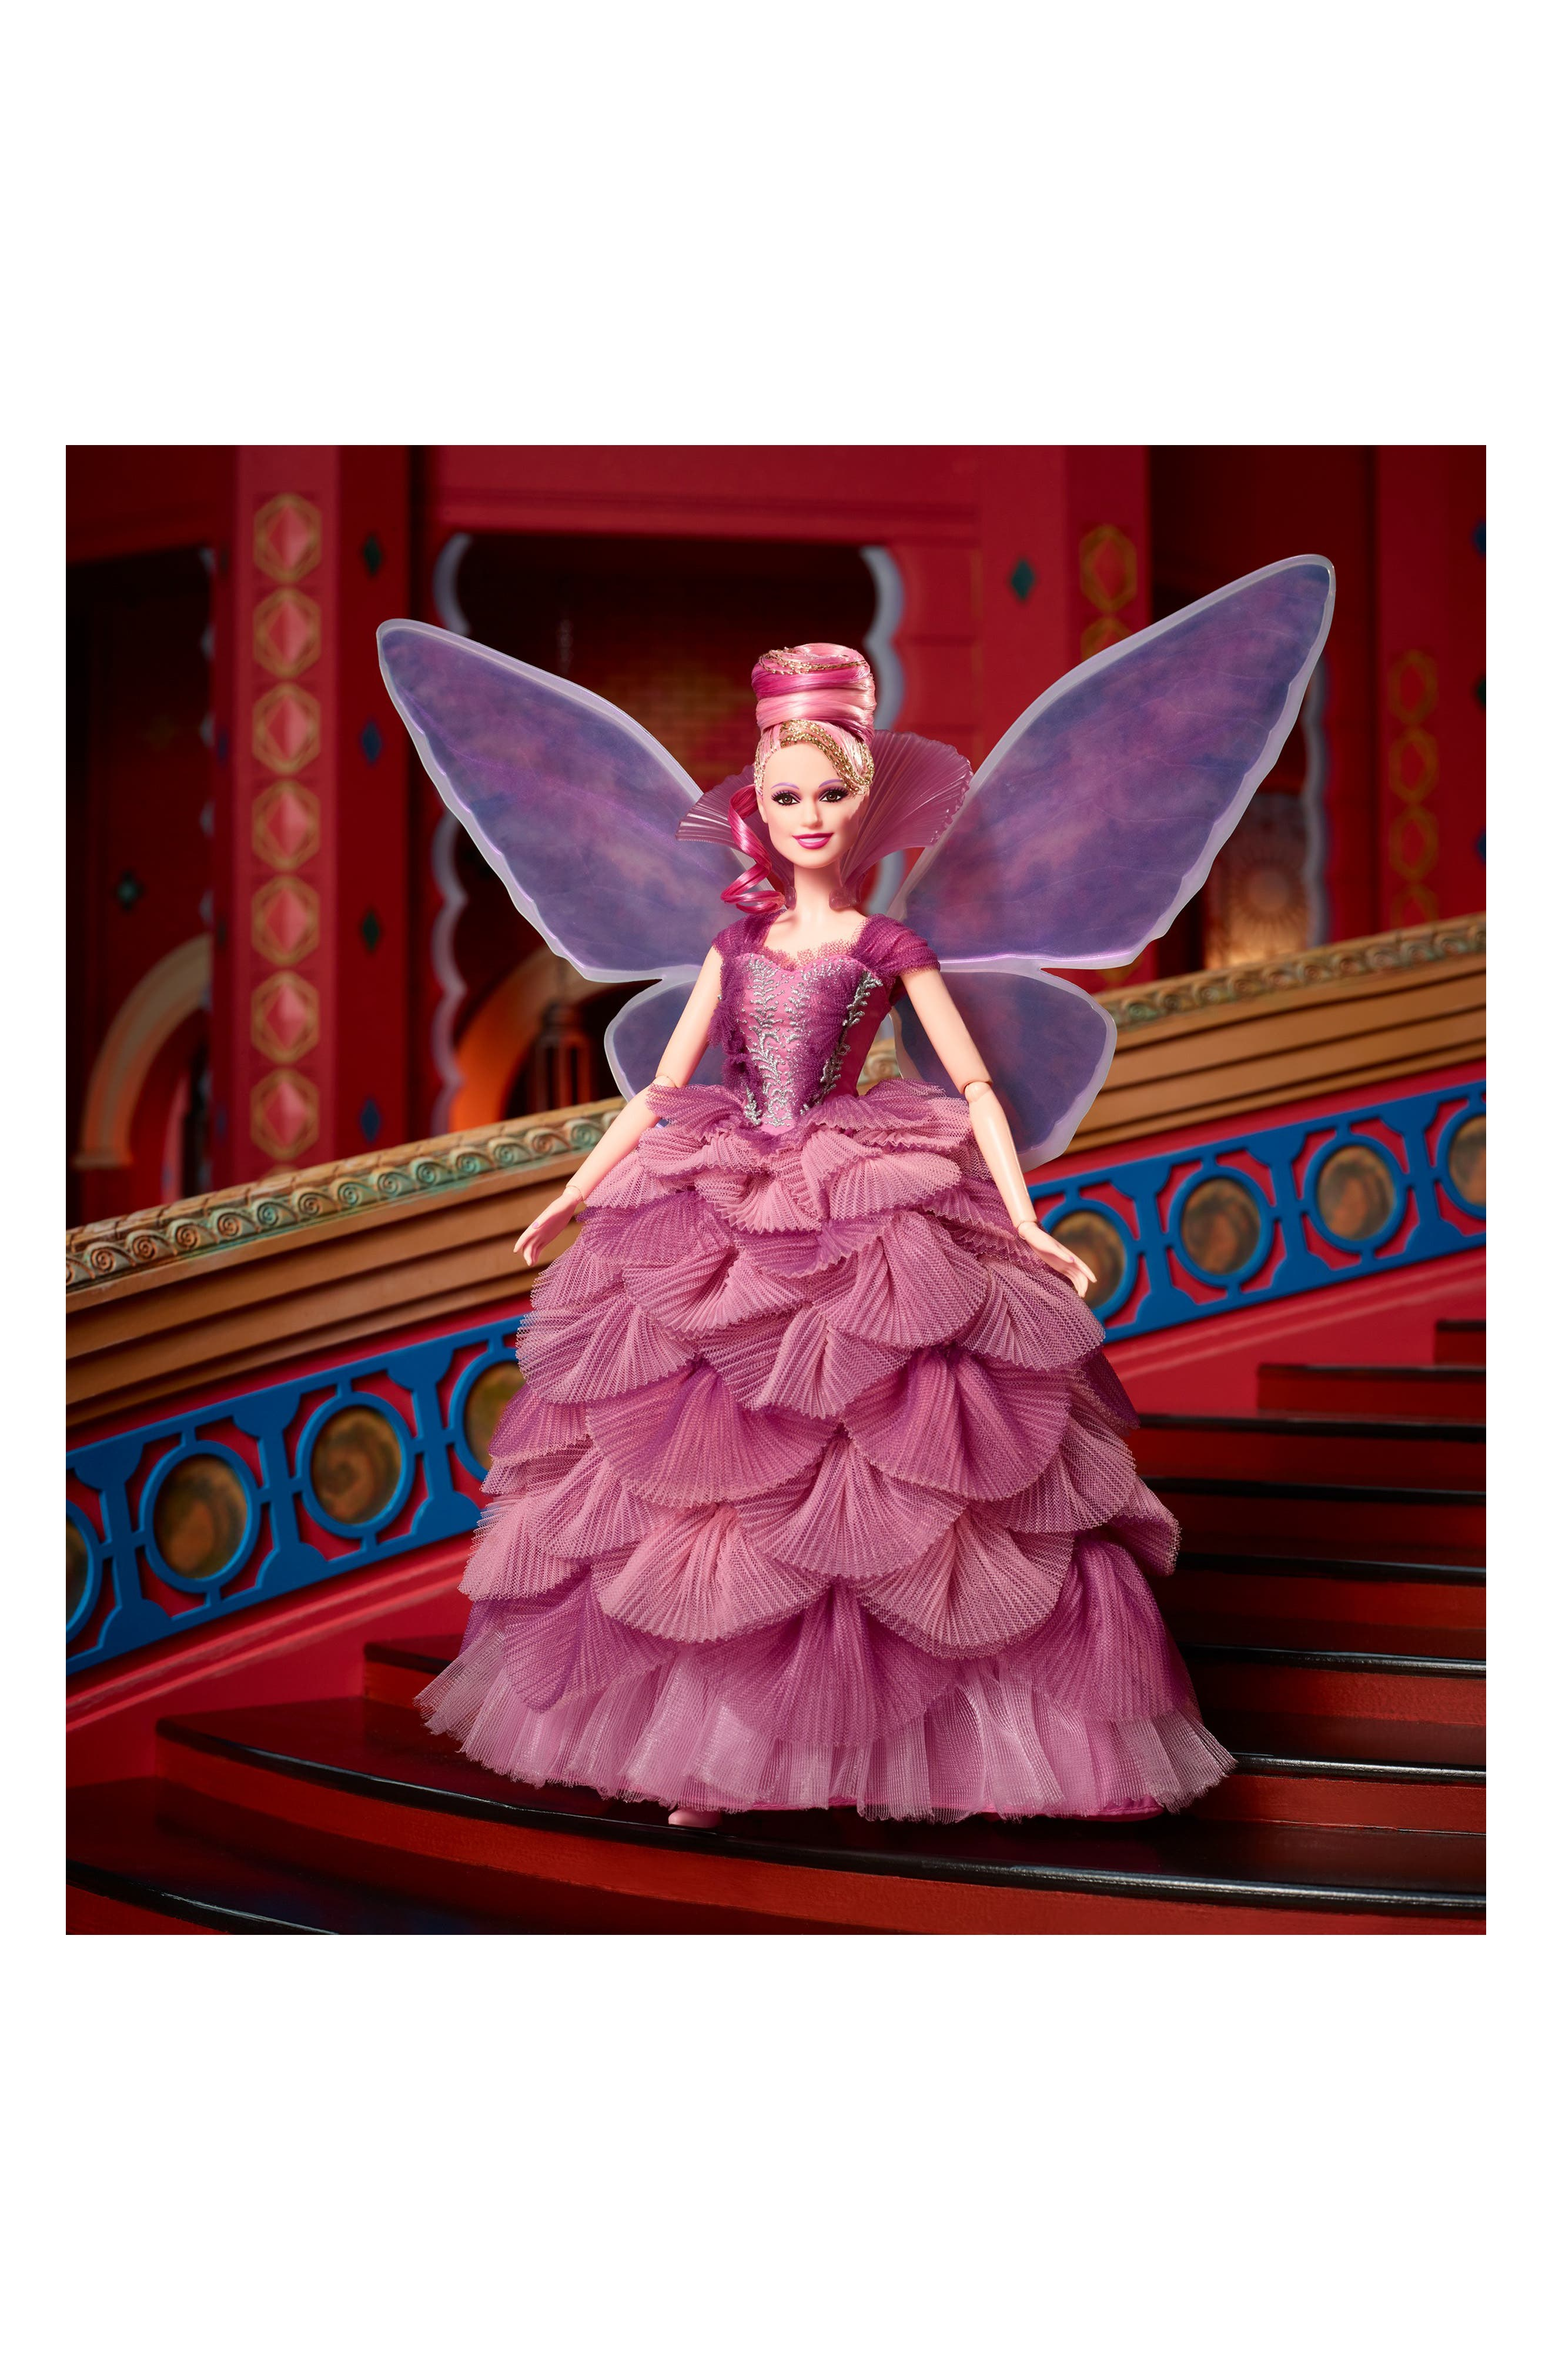 MATTEL,                             Disney<sup>®</sup> The Nutcracker & the Four Realms Sugar Plum Fairy Barbie<sup>®</sup> Doll,                             Alternate thumbnail 7, color,                             960